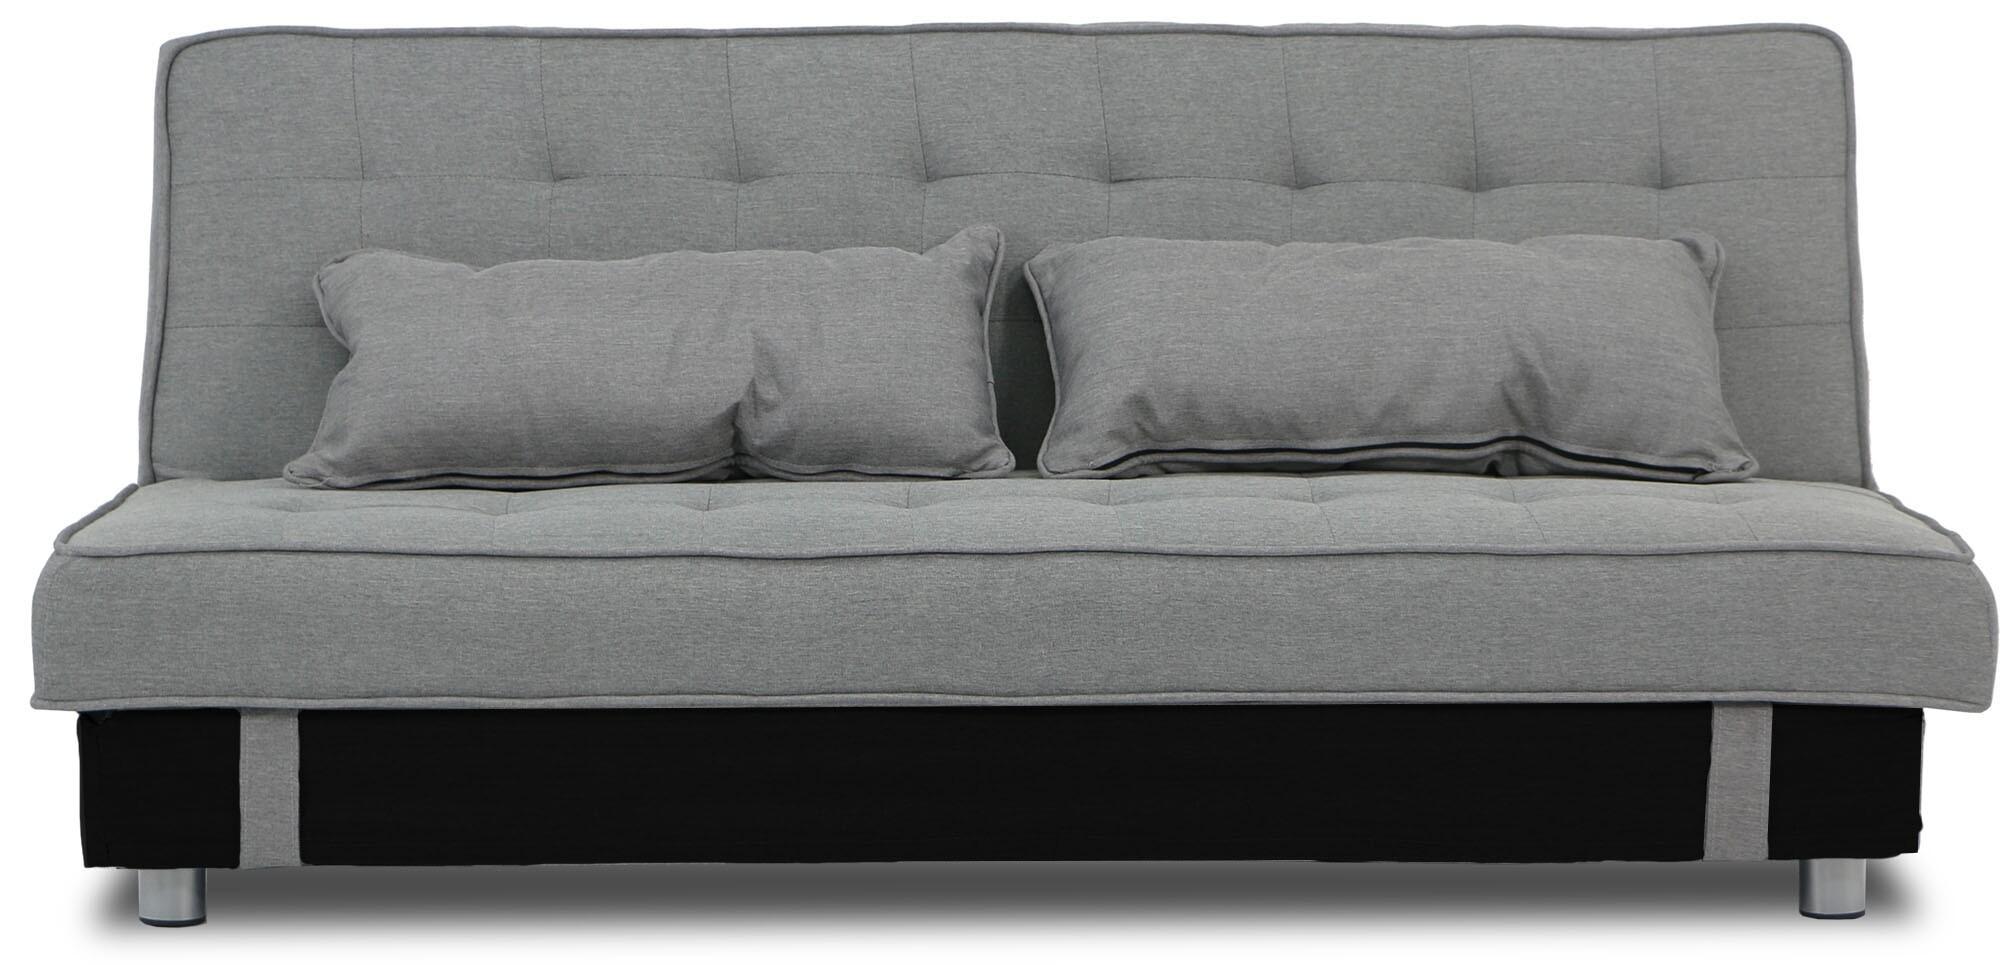 Steinar Storage Sofa Bed Grey Furniture Home Decor Fortytwo